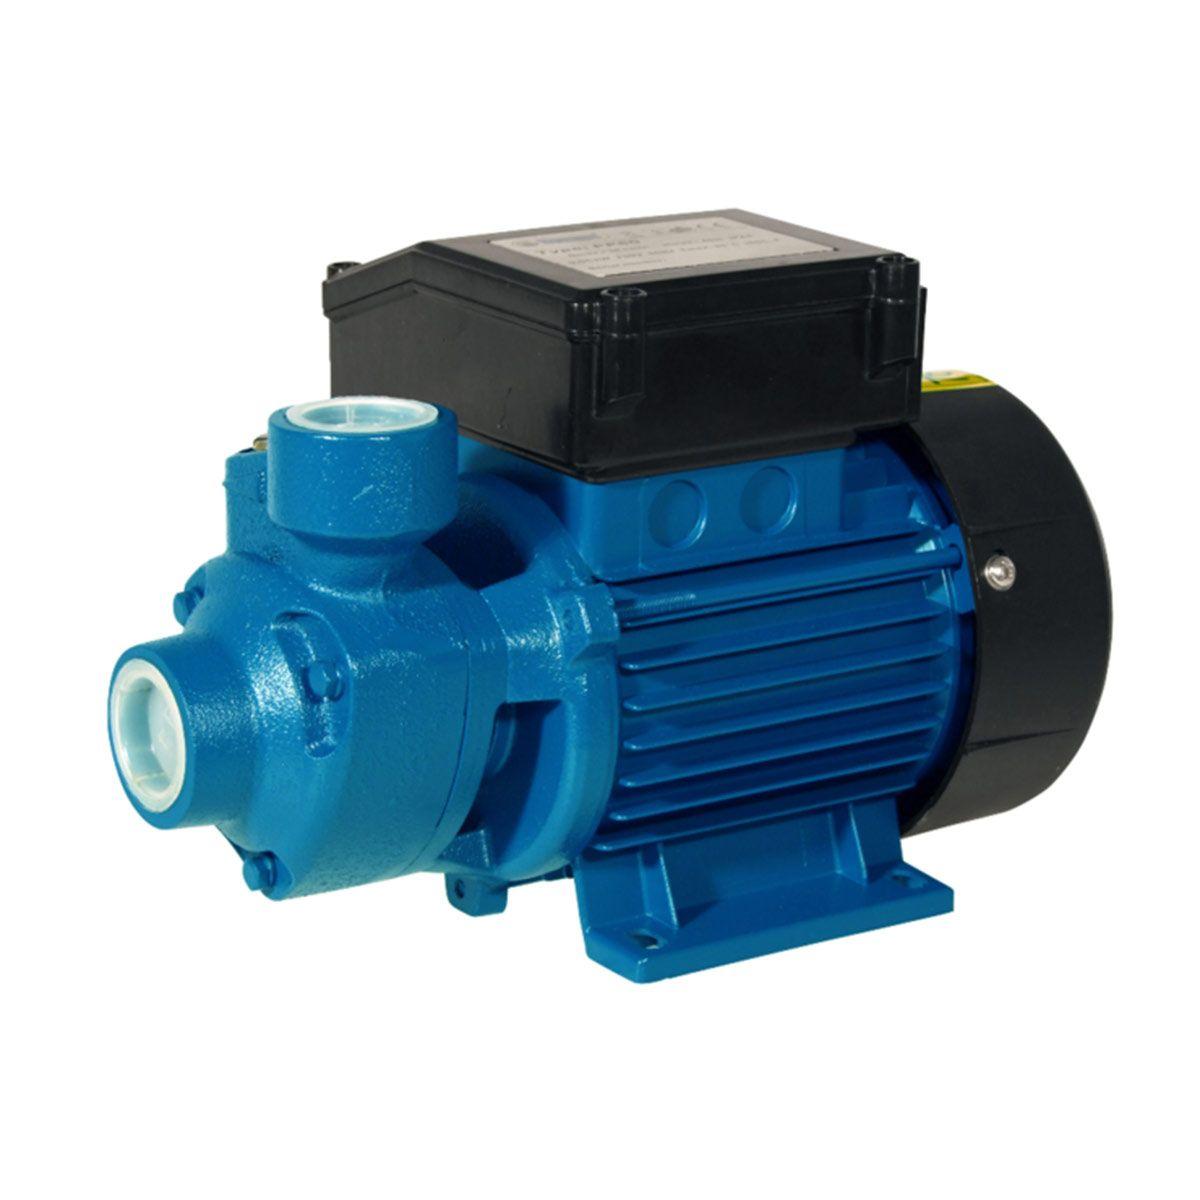 Kreiselpumpe PP 60, H max 40.0 m, Q max 2400 l/h, 0.55 kW, 275 x 195 x 195 mm, 1' IG, 230 V